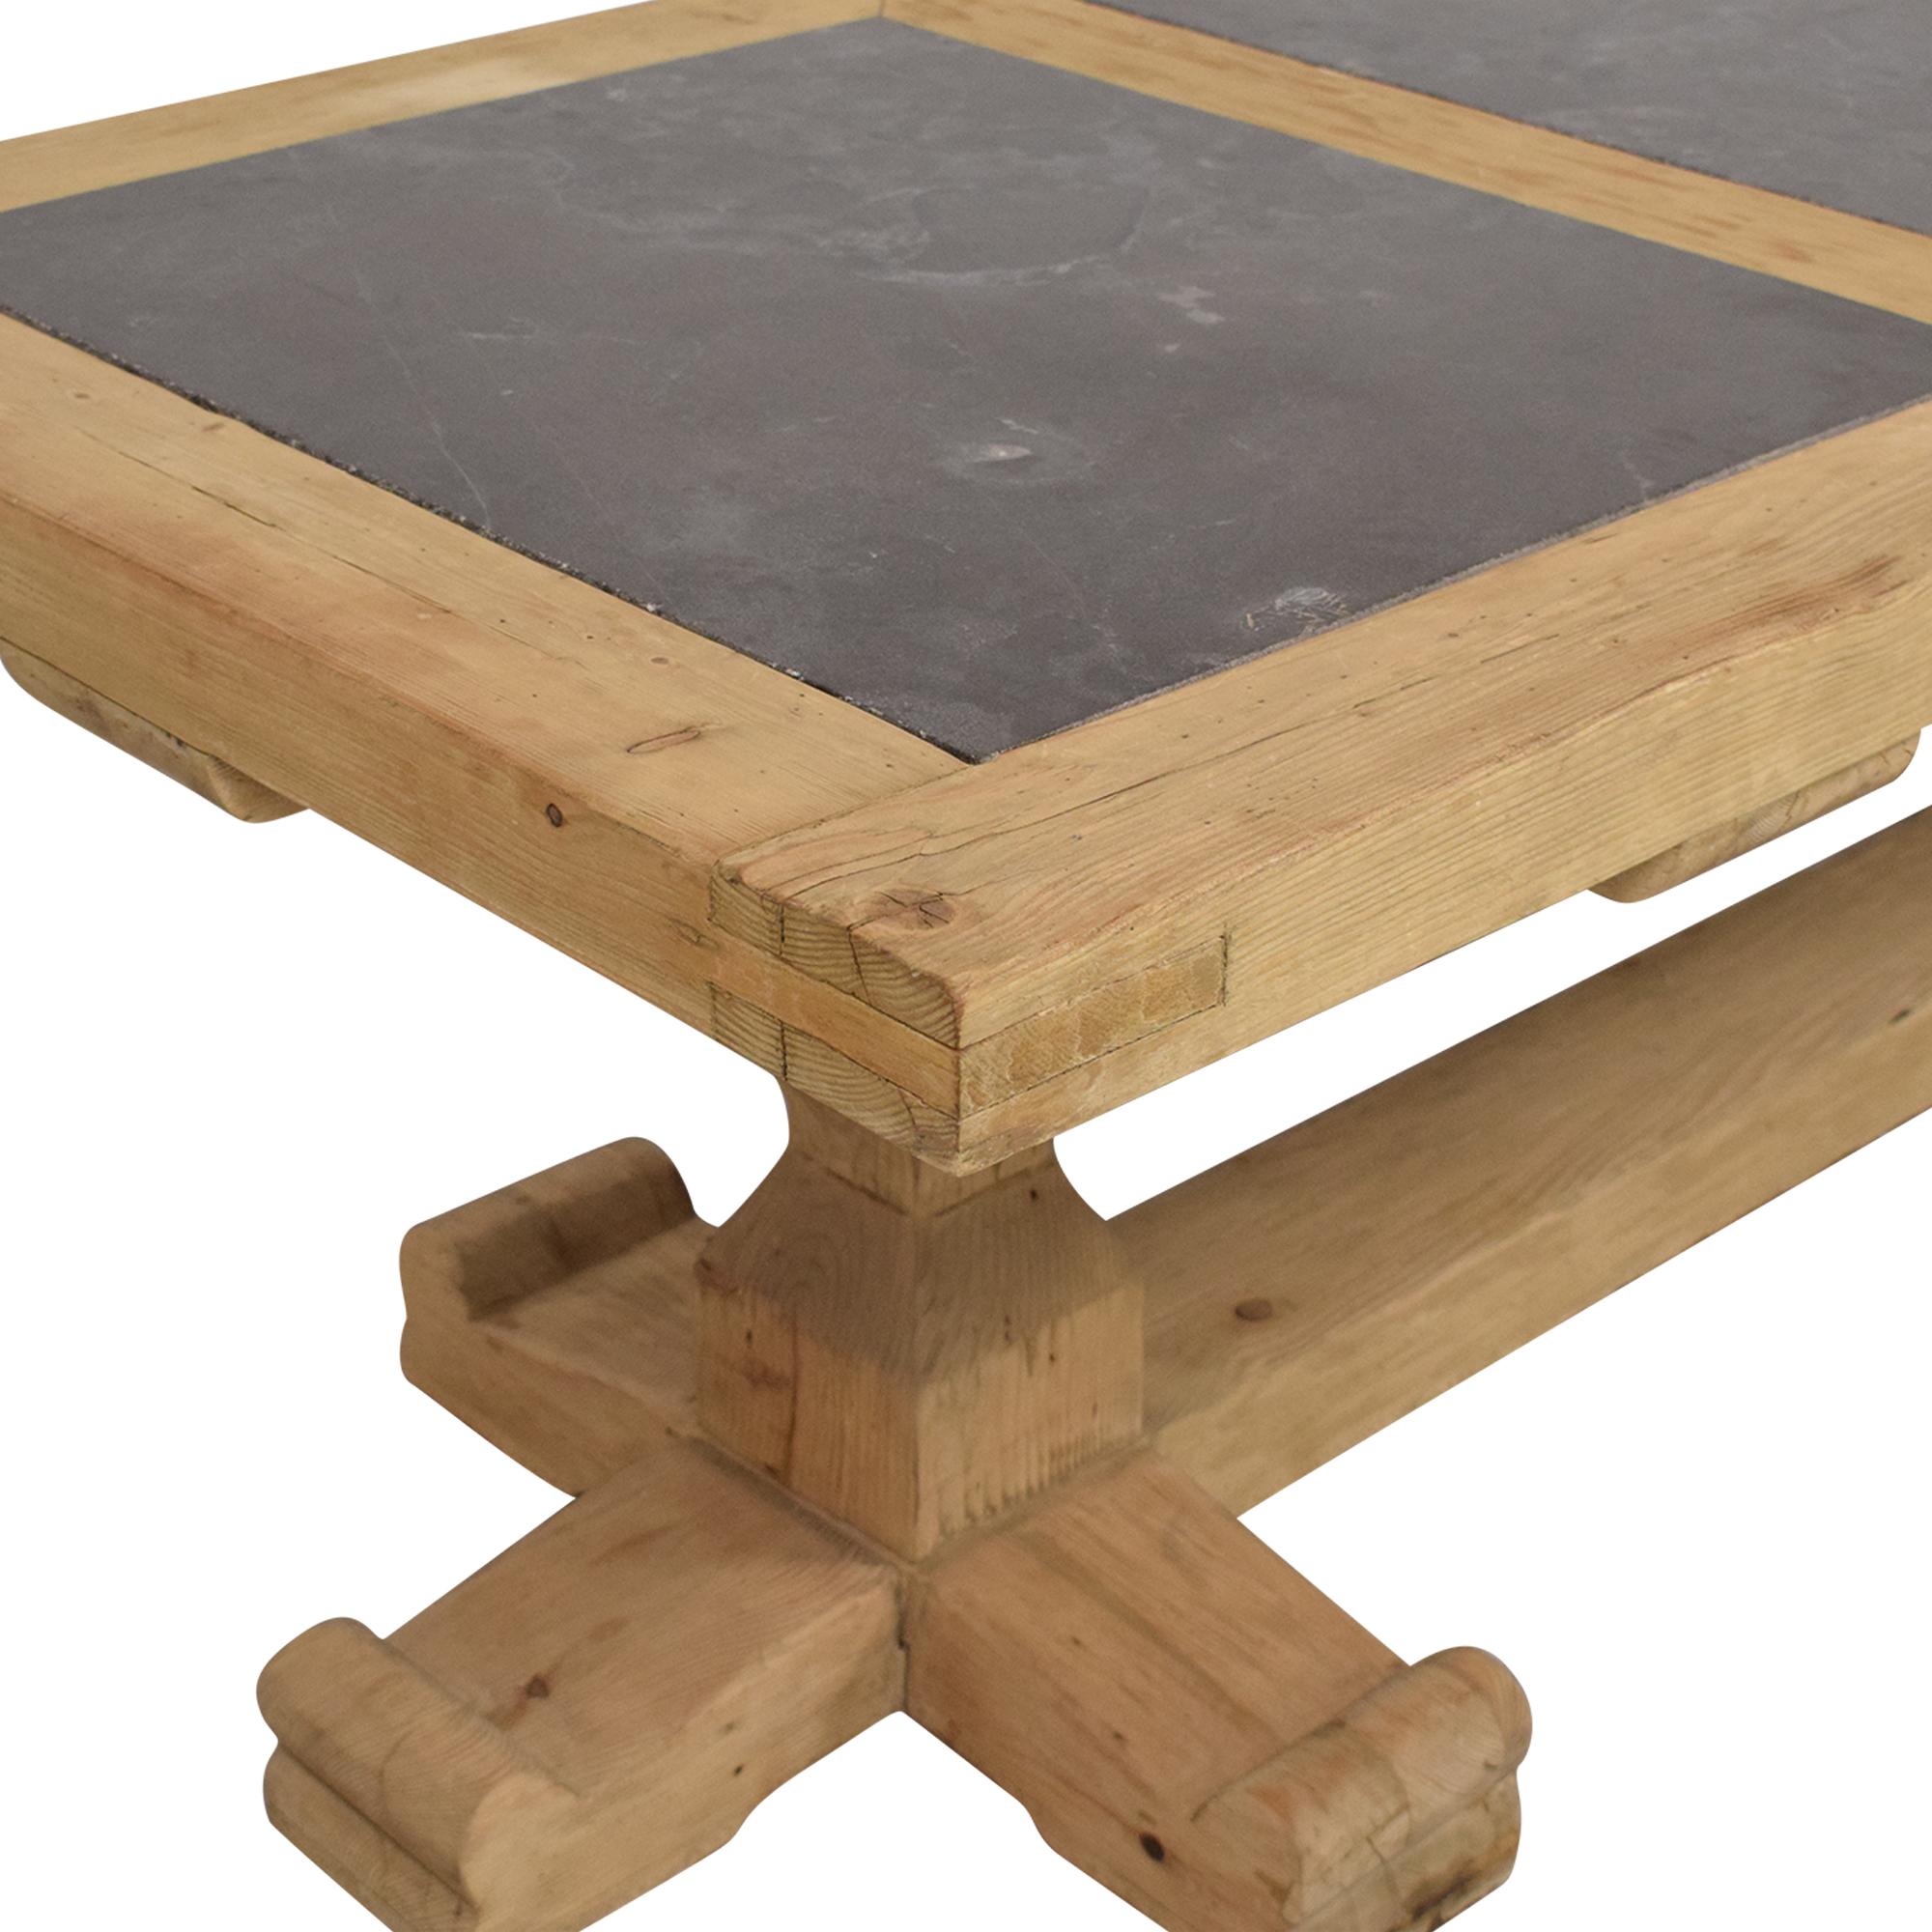 buy Restoration Hardware 18th C. Reclaimed Pine & Bluestone Rectangular Dining Table Restoration Hardware Dinner Tables